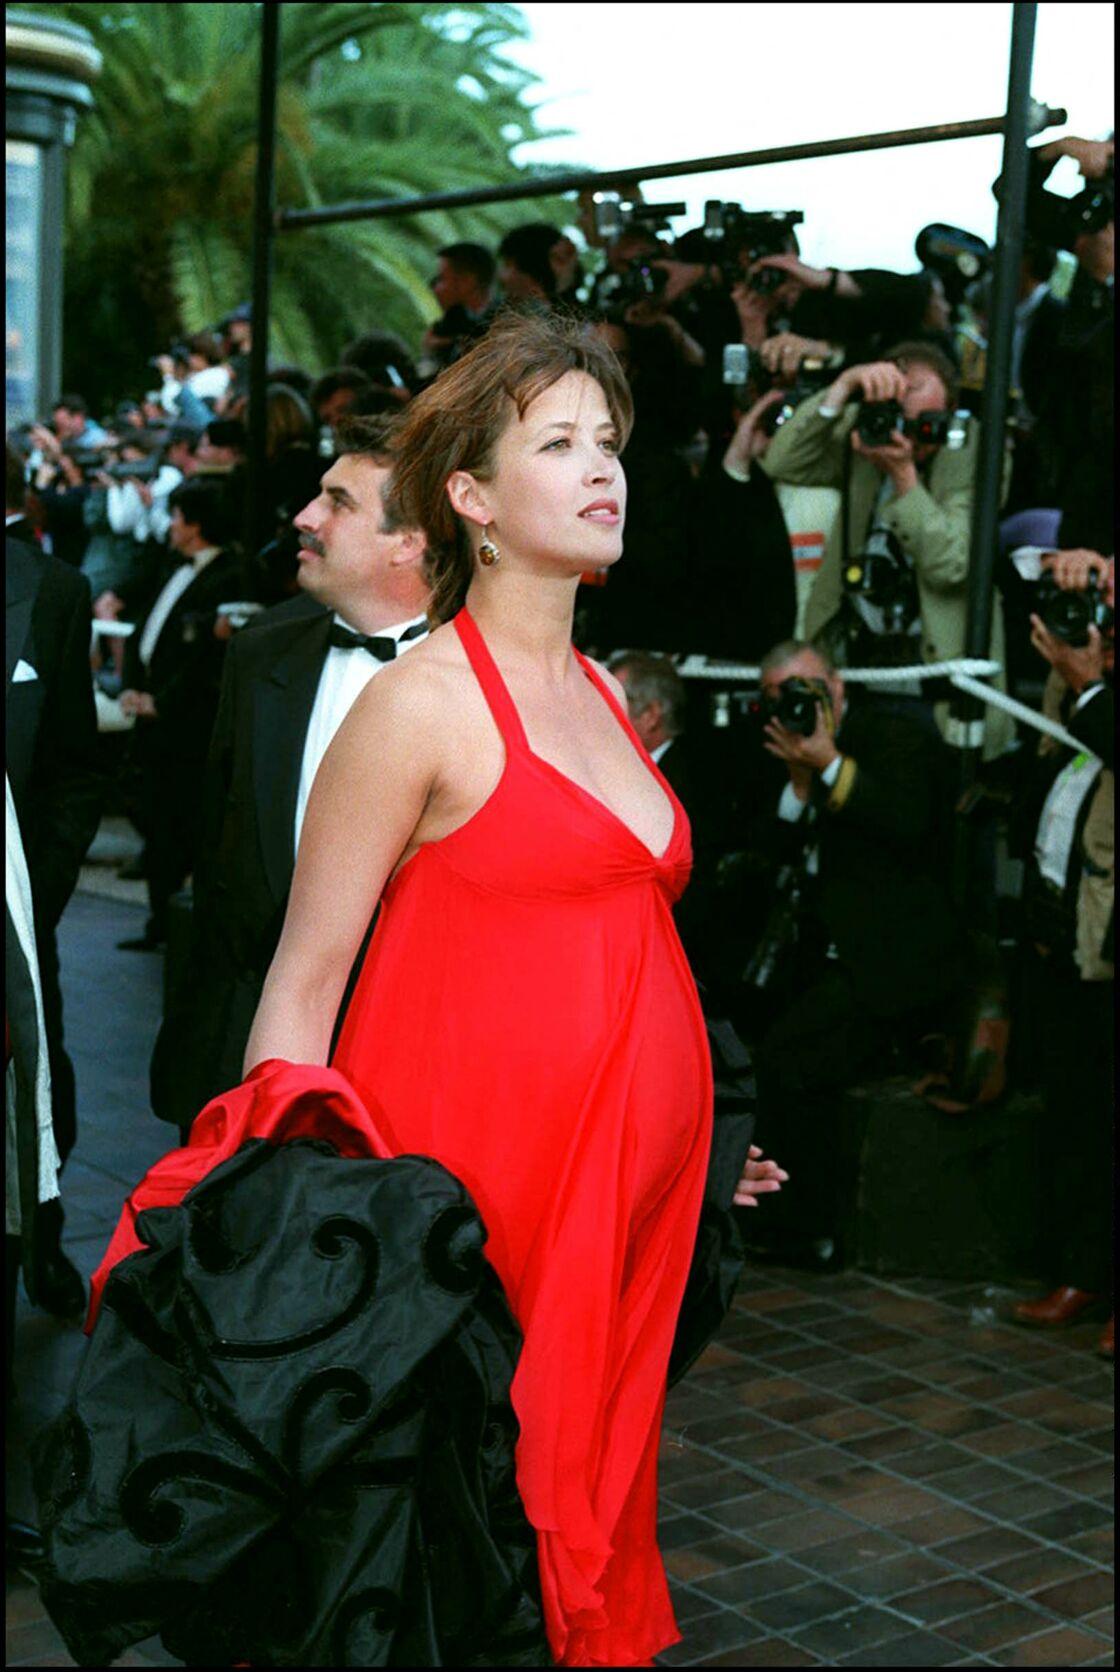 Sophie Marceau enceinte en robe flamboyante à Cannes en 1995